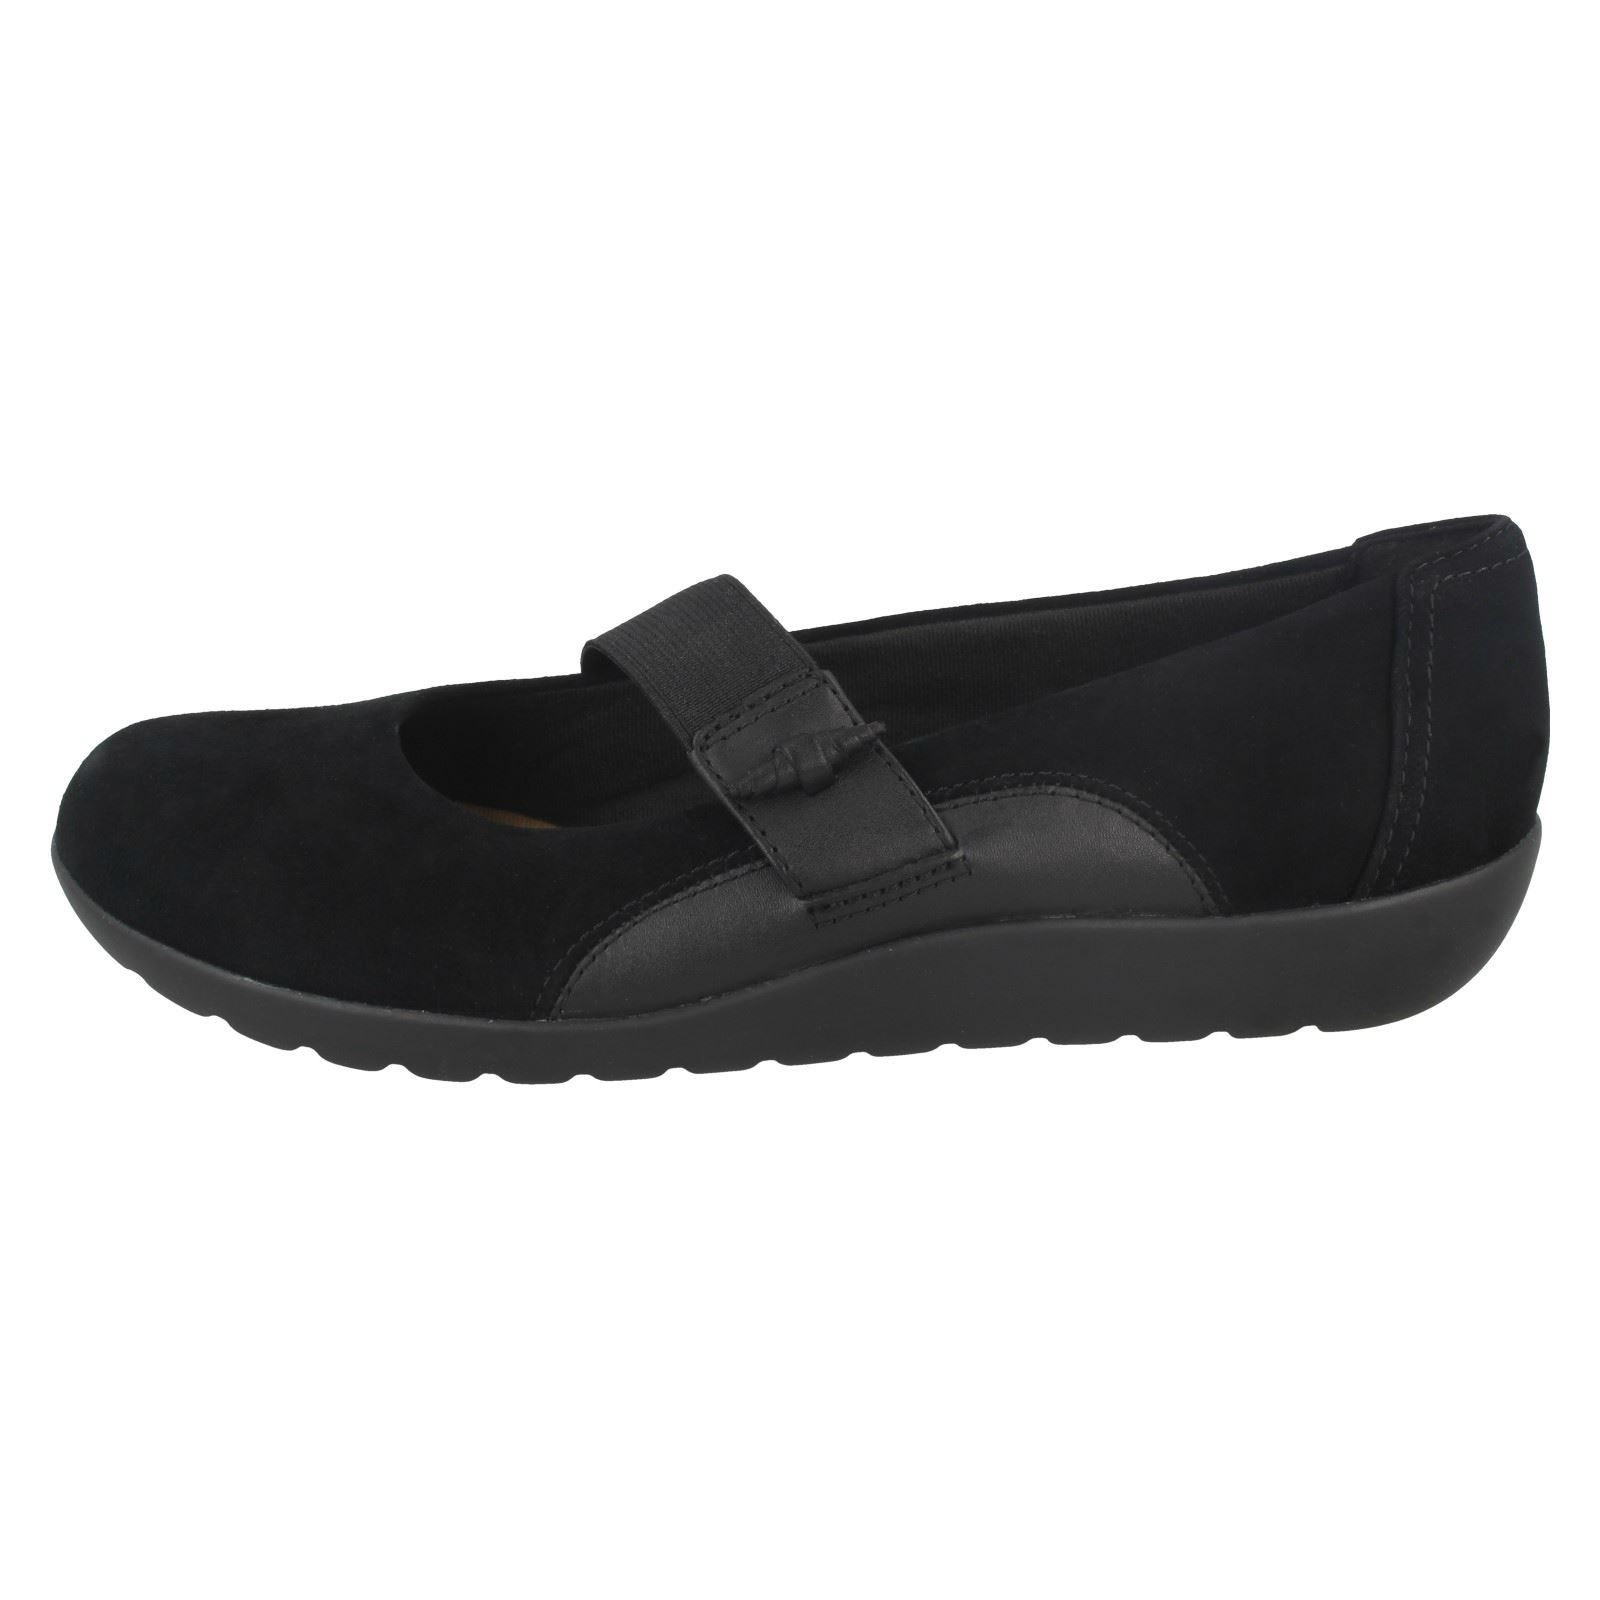 Clarks Black Ladies Elasticated Frost Strap Medora Shoes 6waqrazd